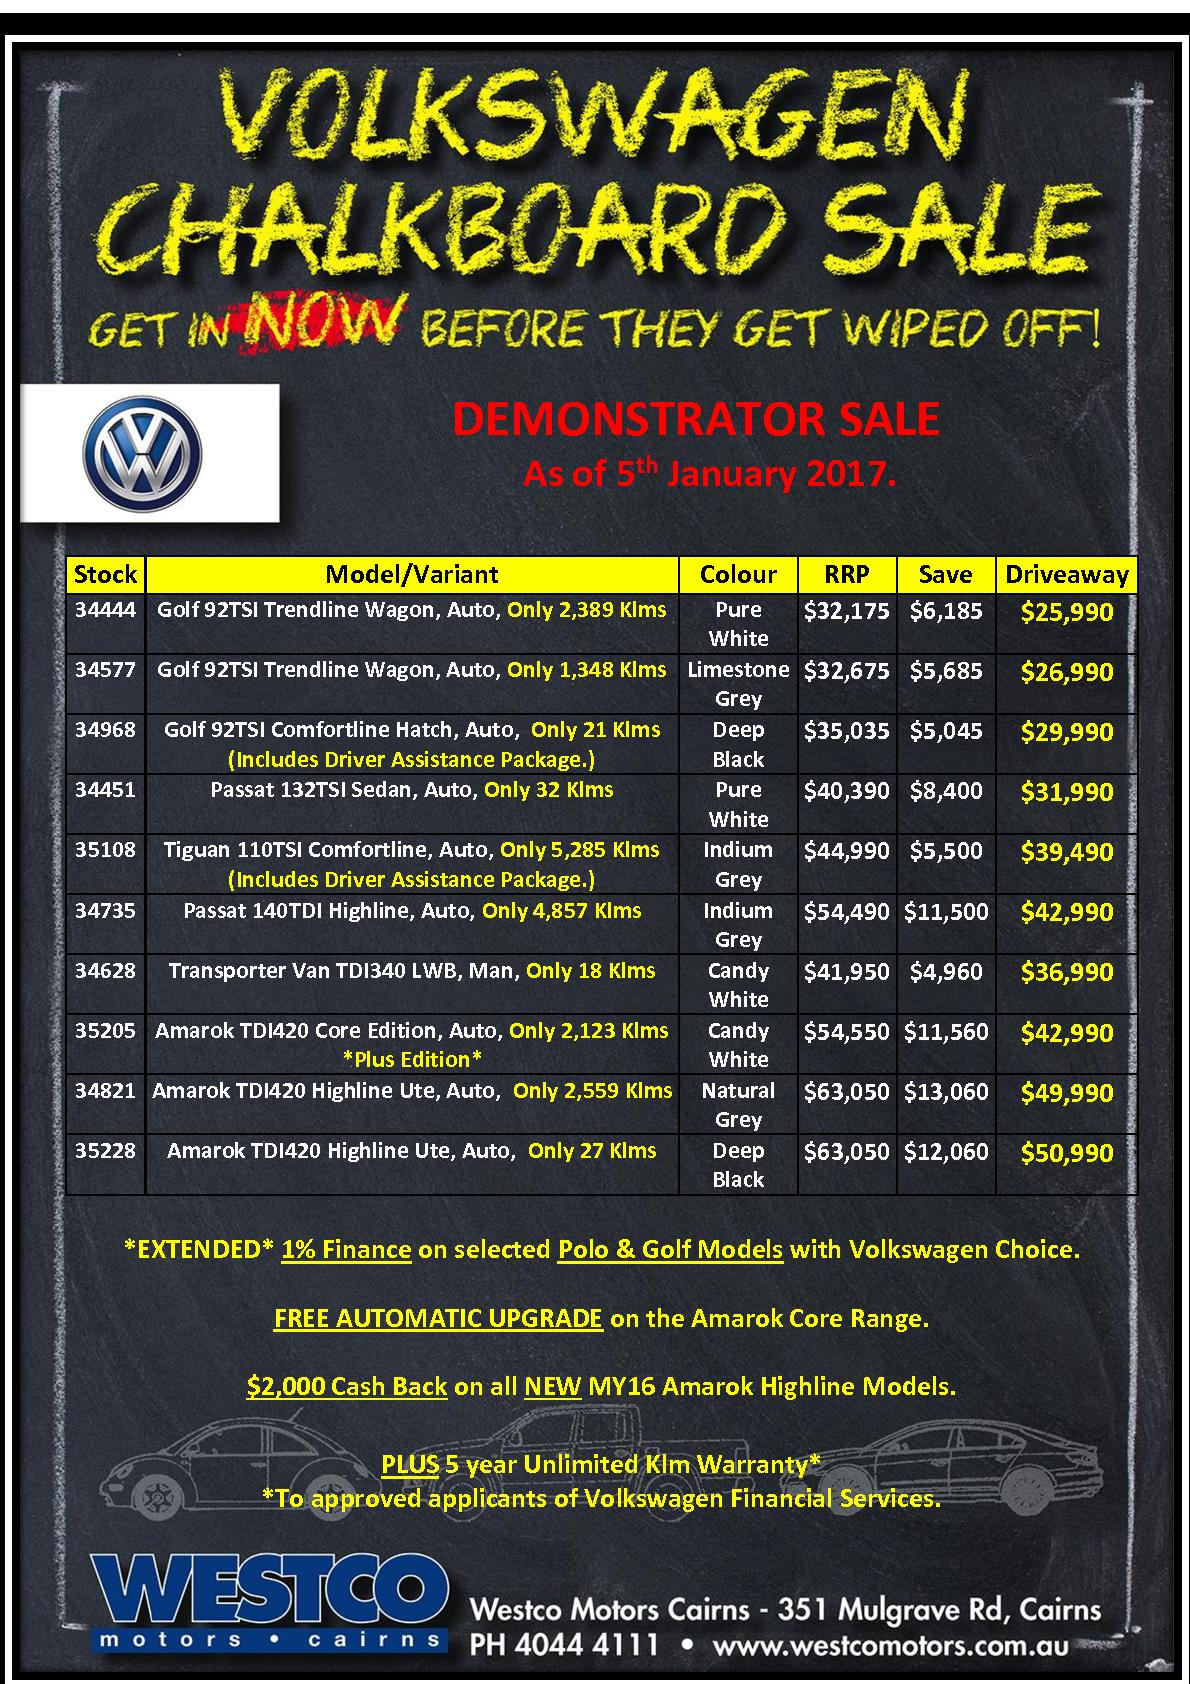 Volkswagen Chalkboard Sale